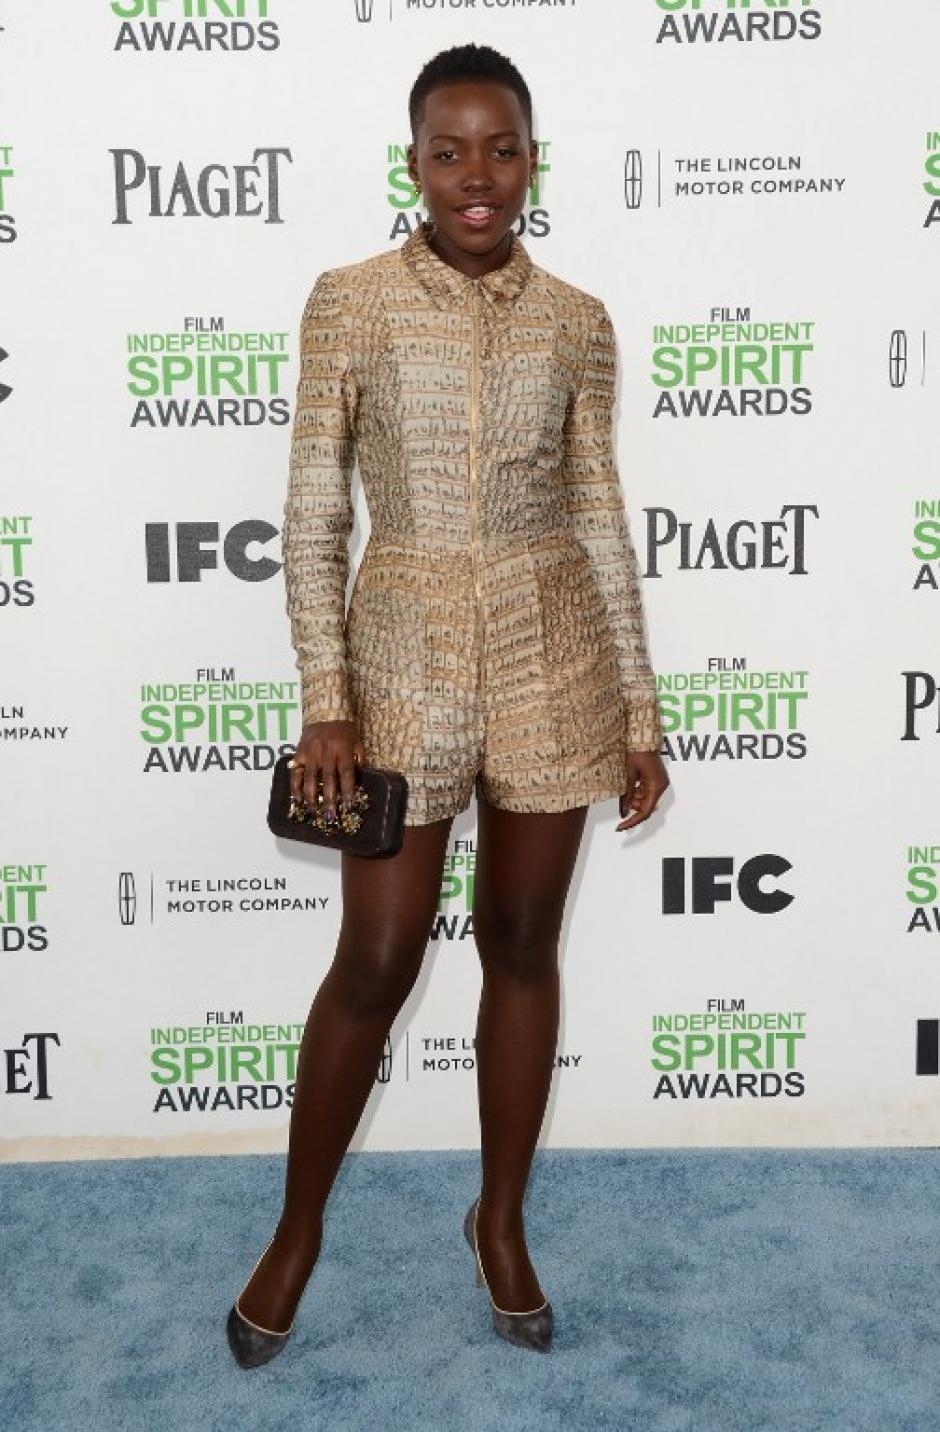 Lupita Nyong'o mexicana de origen pero educada en Kenia, lució este traje en imitación de piel de lagarto. (Foto: AFP)